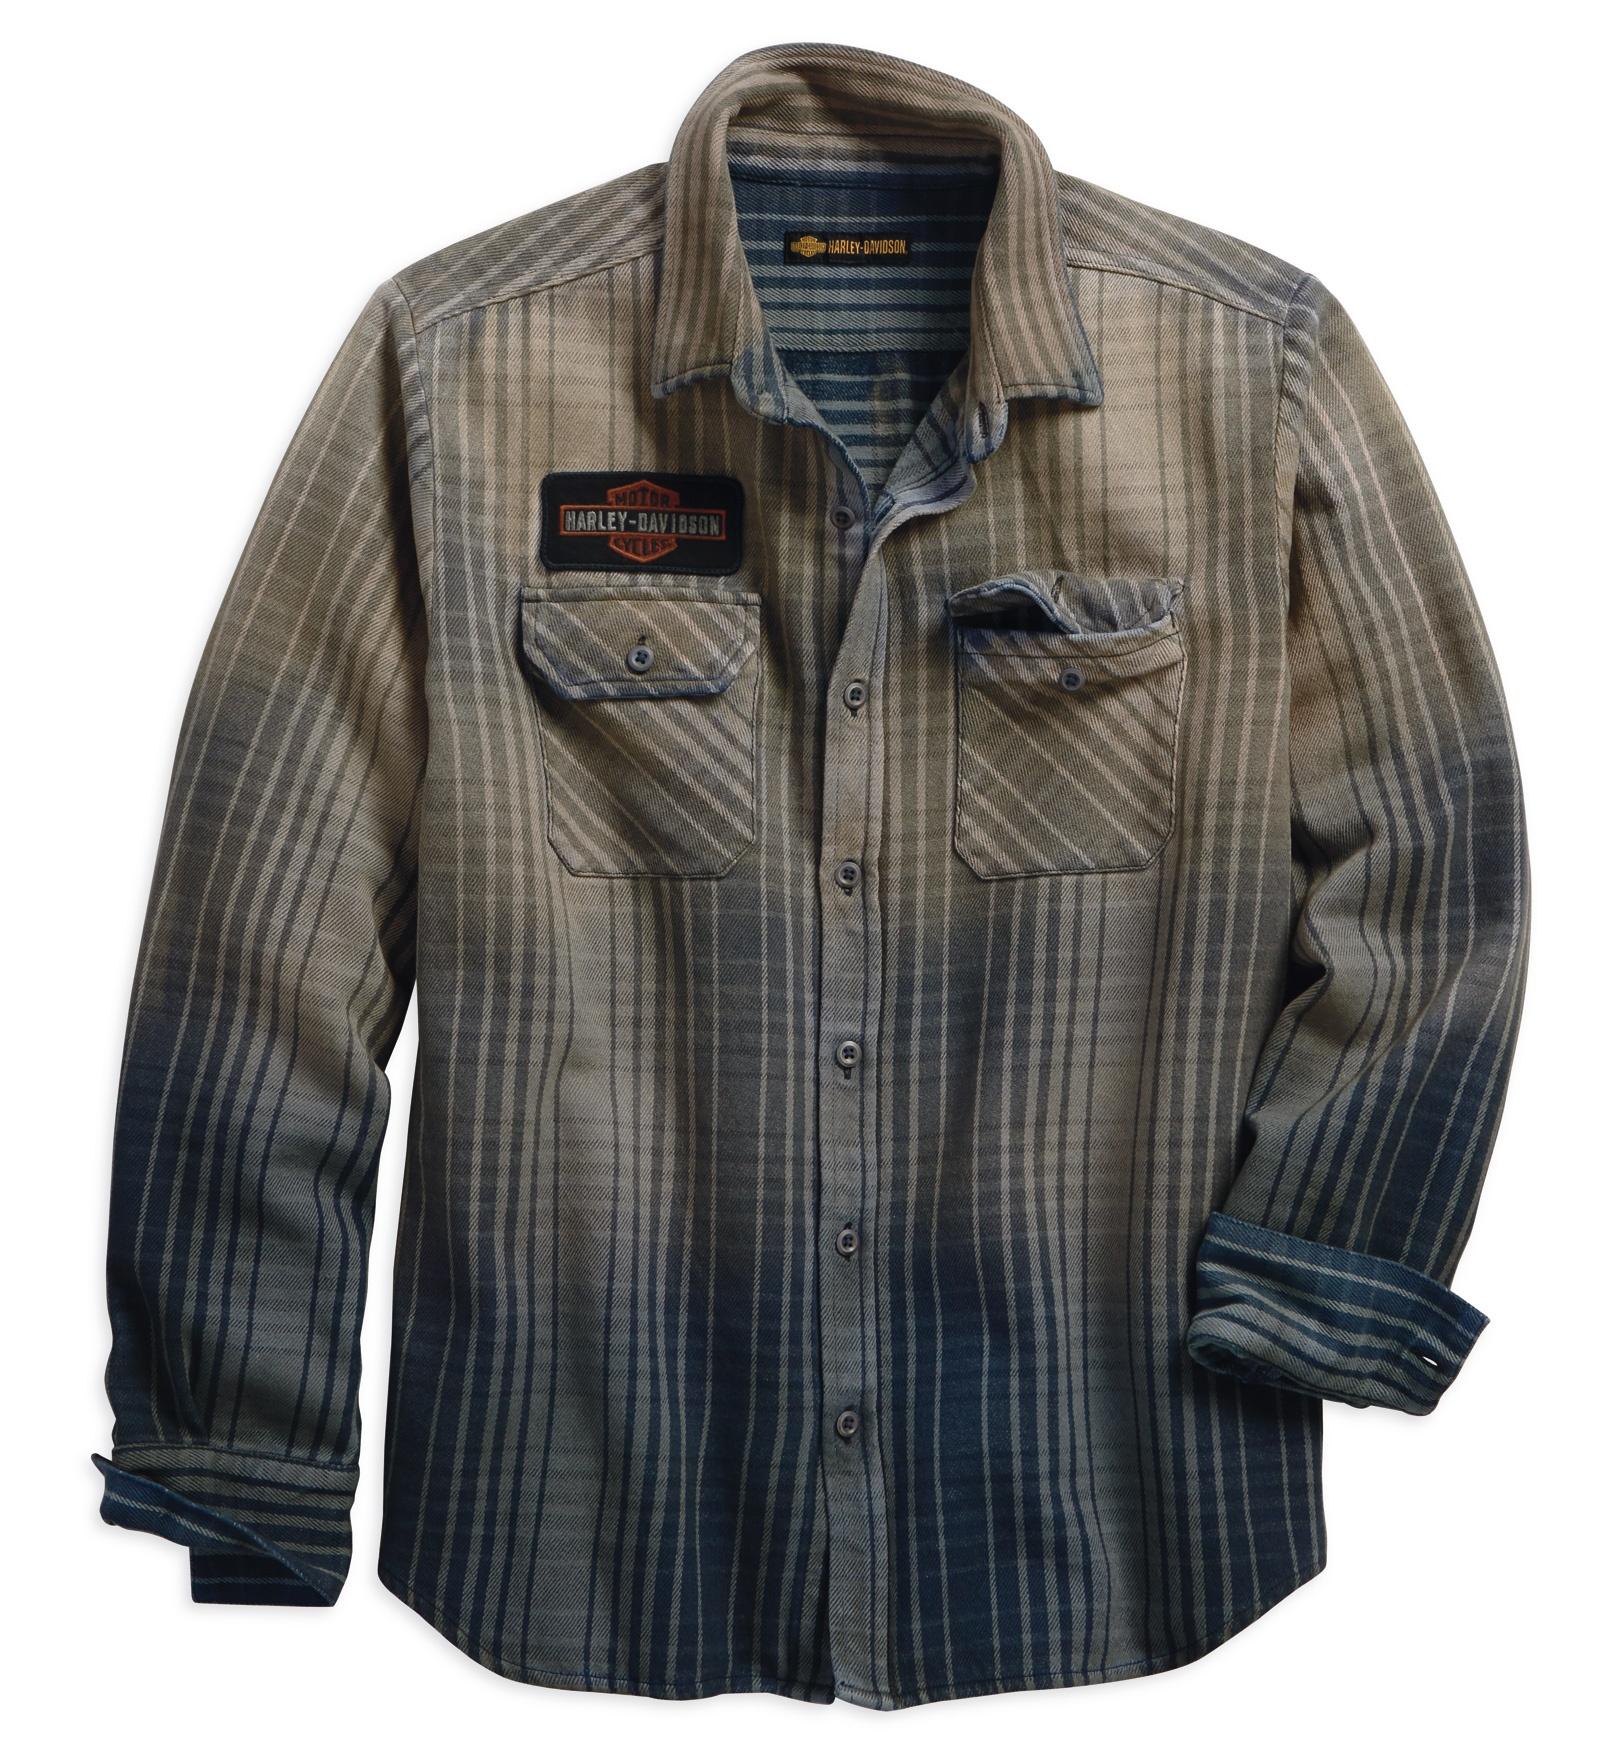 hight resolution of  h d motorclothes harley davidson schematic plaid slim fit shirt 99097 18vm